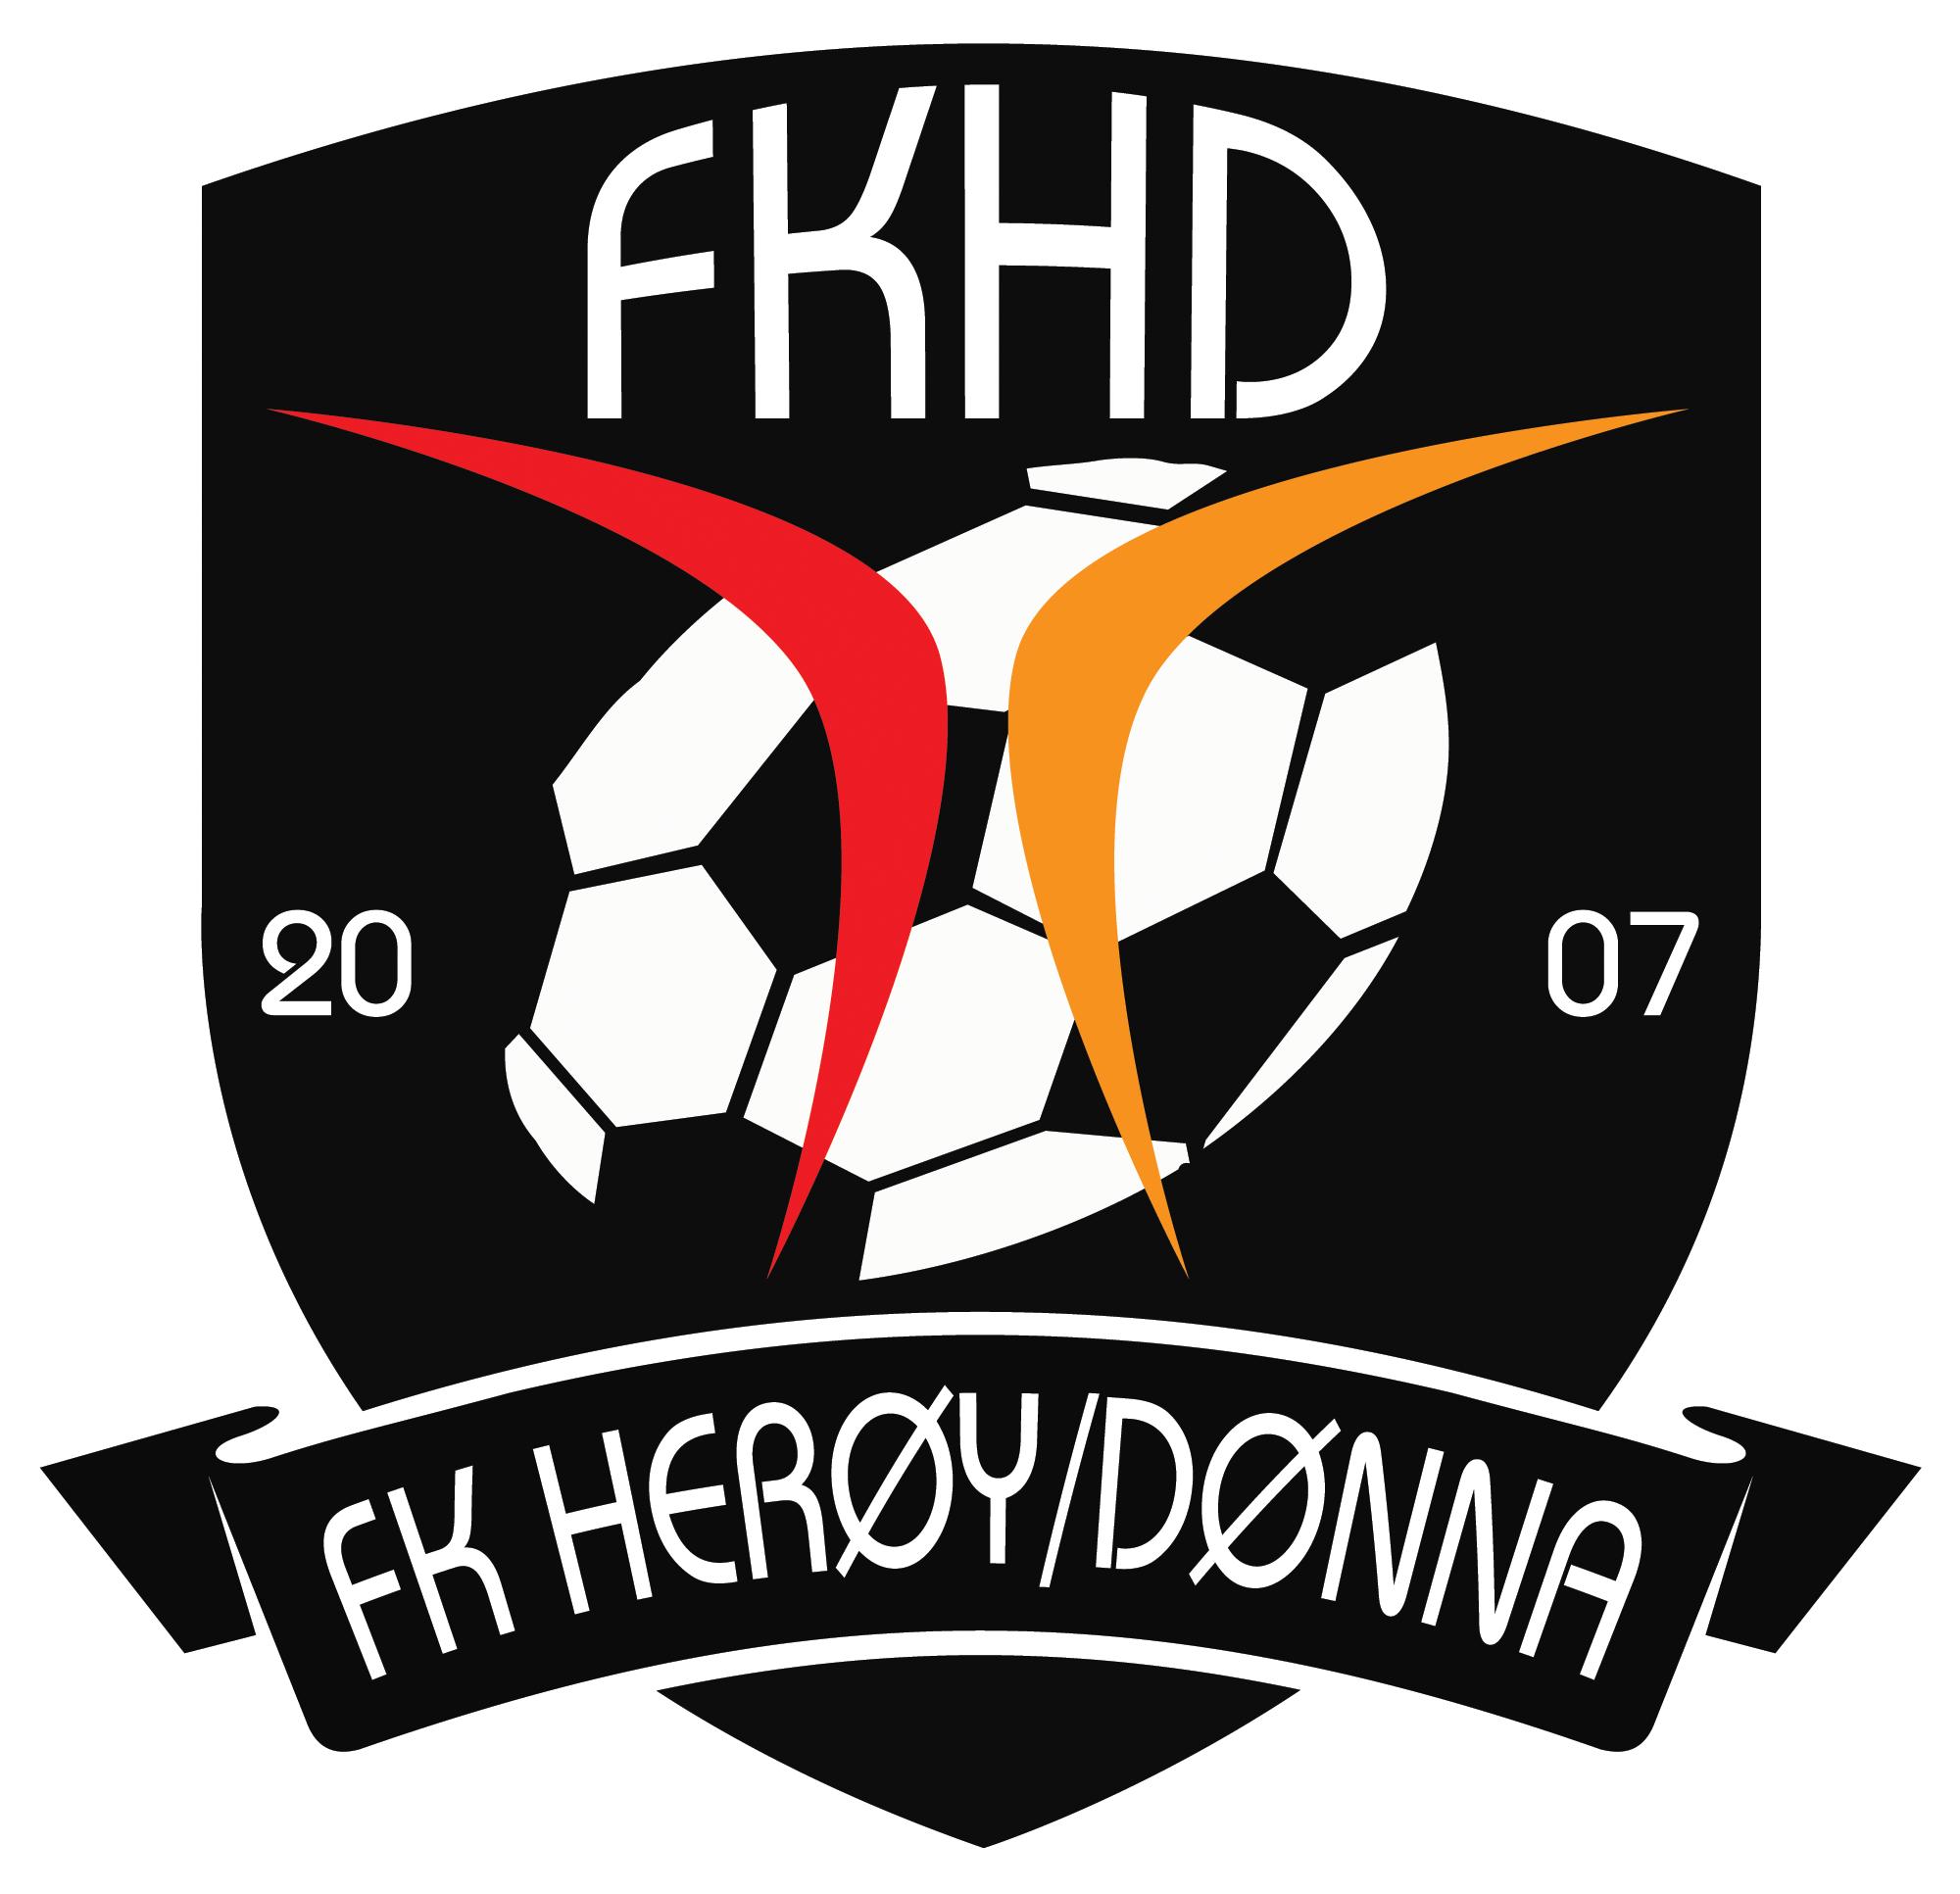 heroy_donna_logo